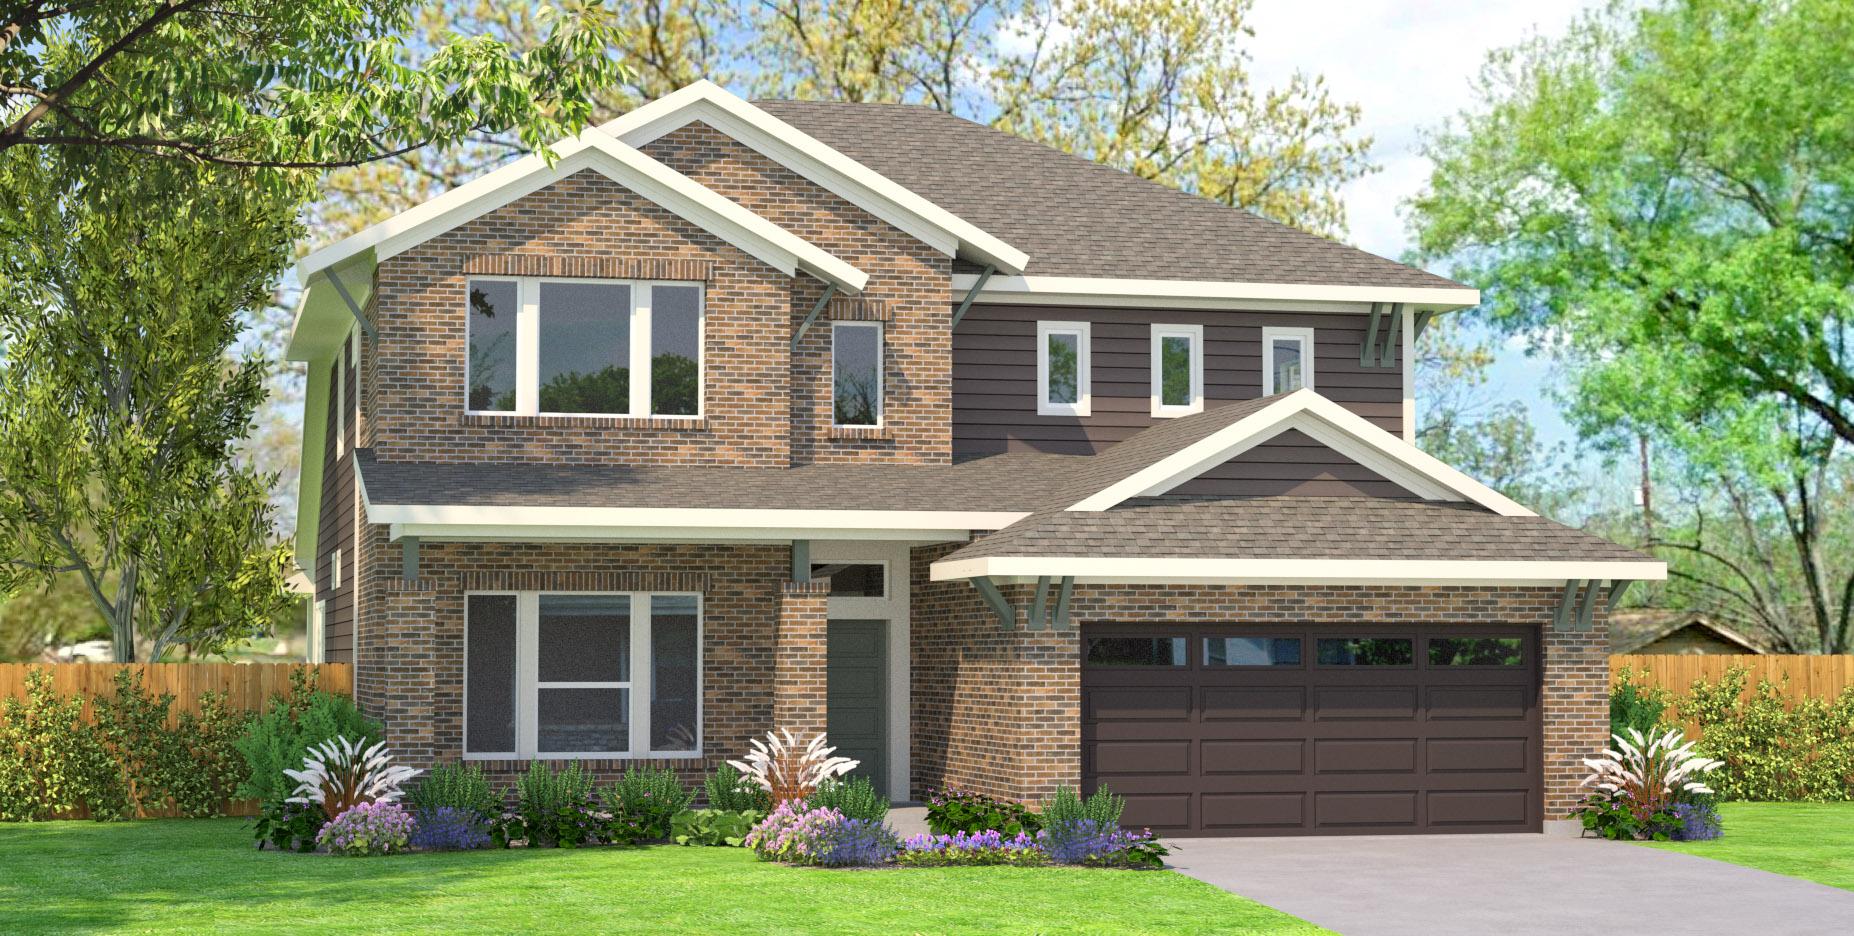 3D Exterior Home Rendering - Brick